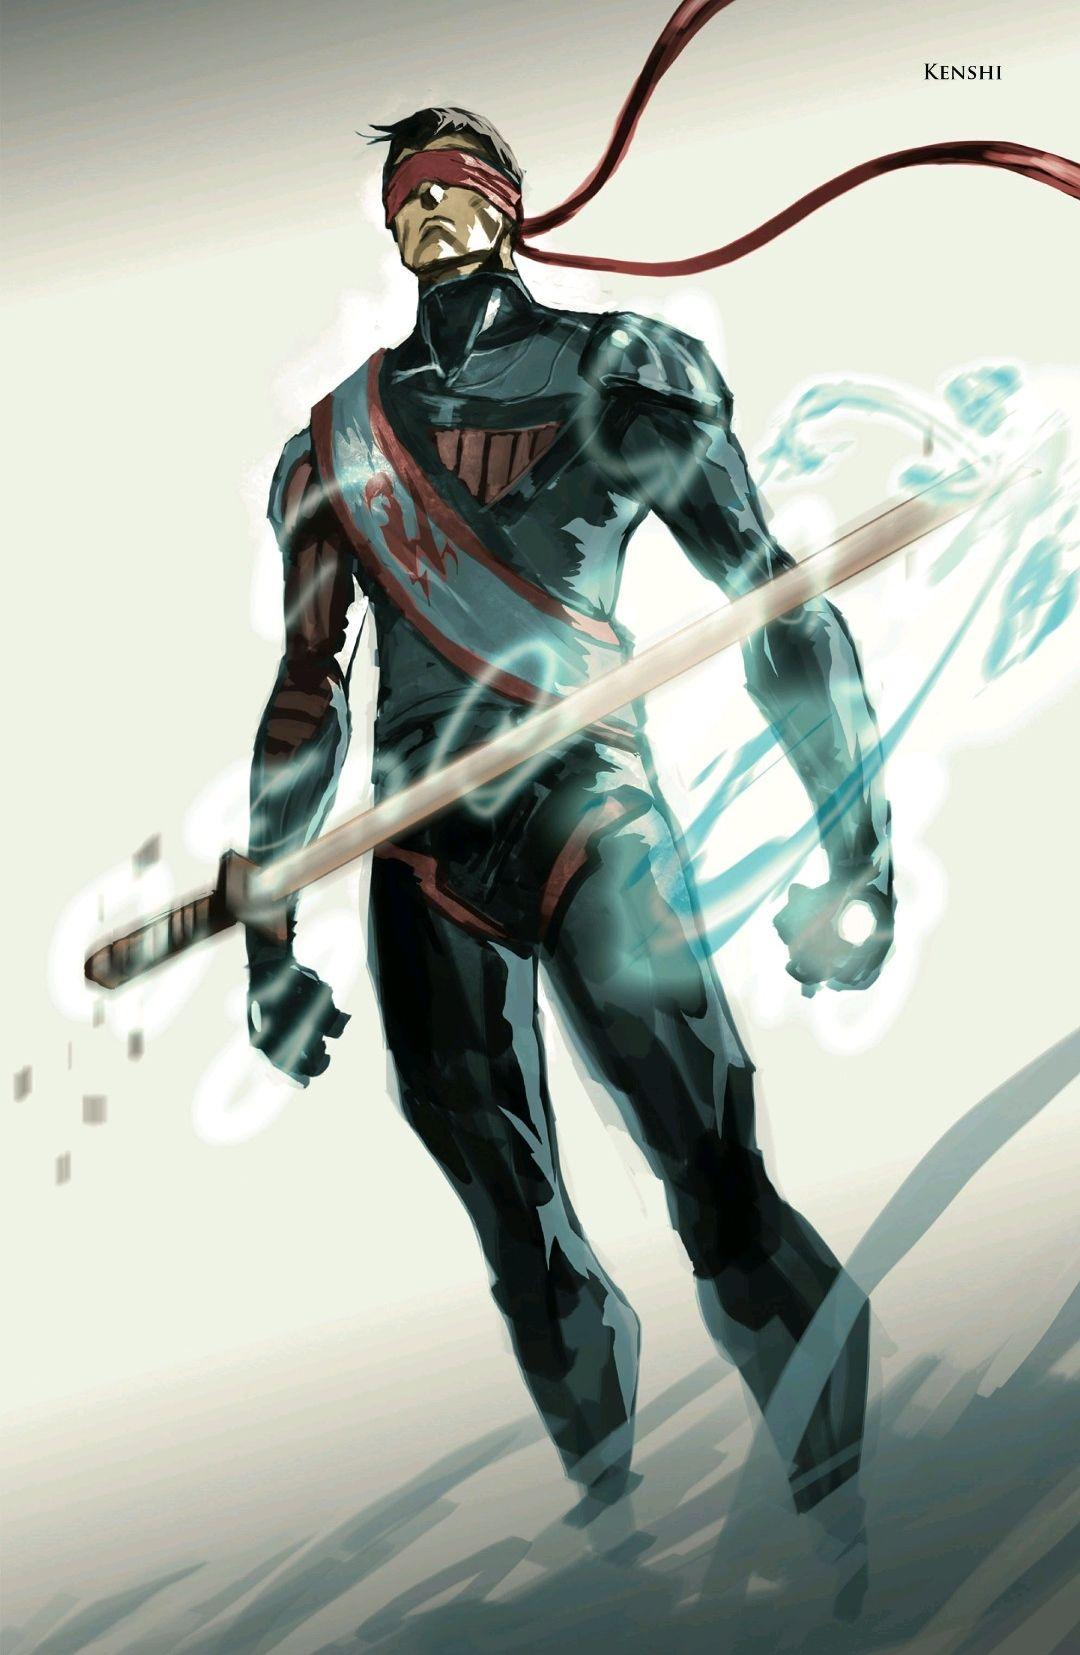 The Son of Kenshi(Male MK Reader X DxD harem) - Bio - Wattpad